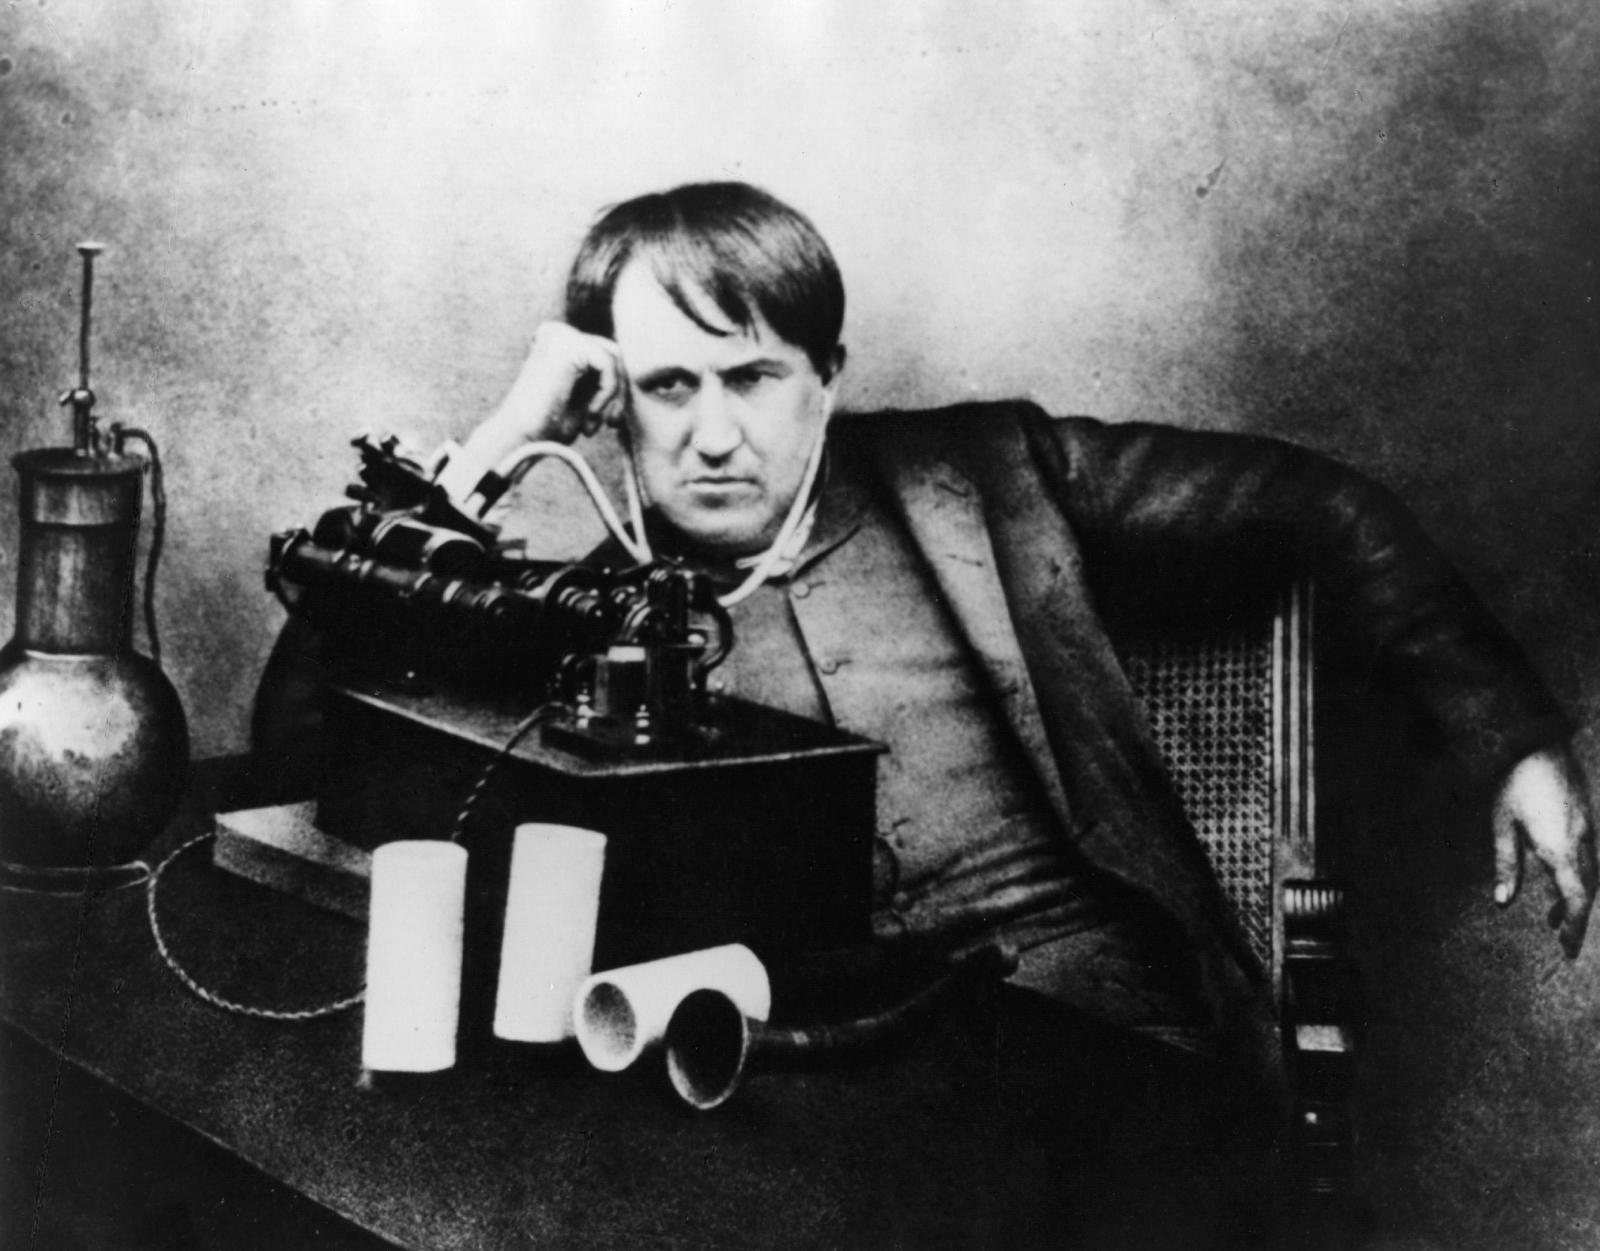 Thomas Edison and the phonograph